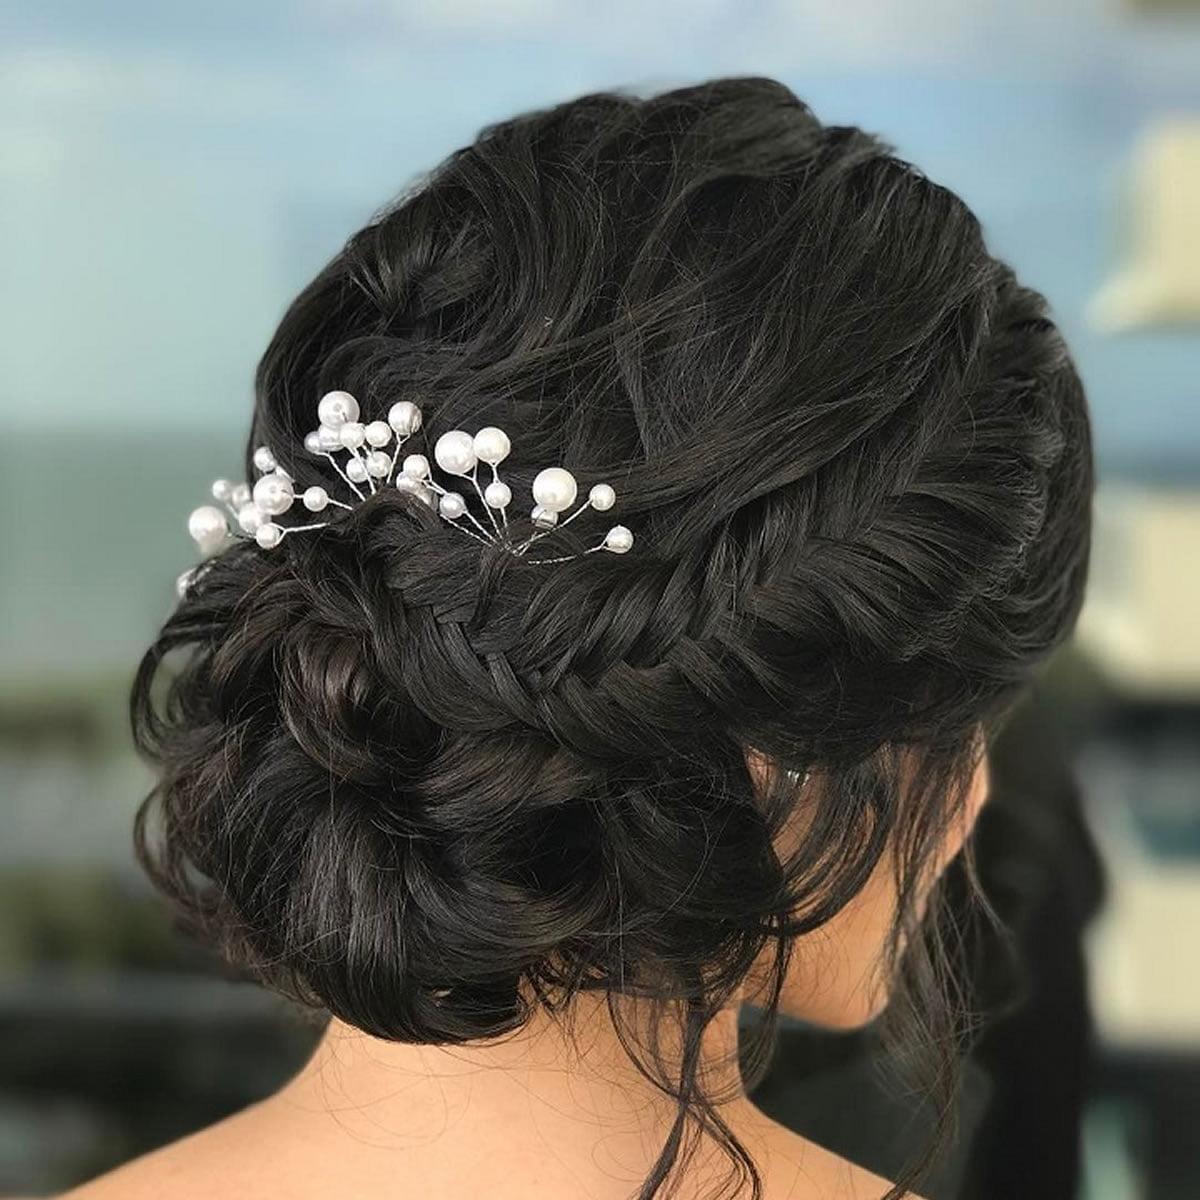 25 Very Stylish Soft Braided Hairstyles ideas 2018-2019 ... - photo #40